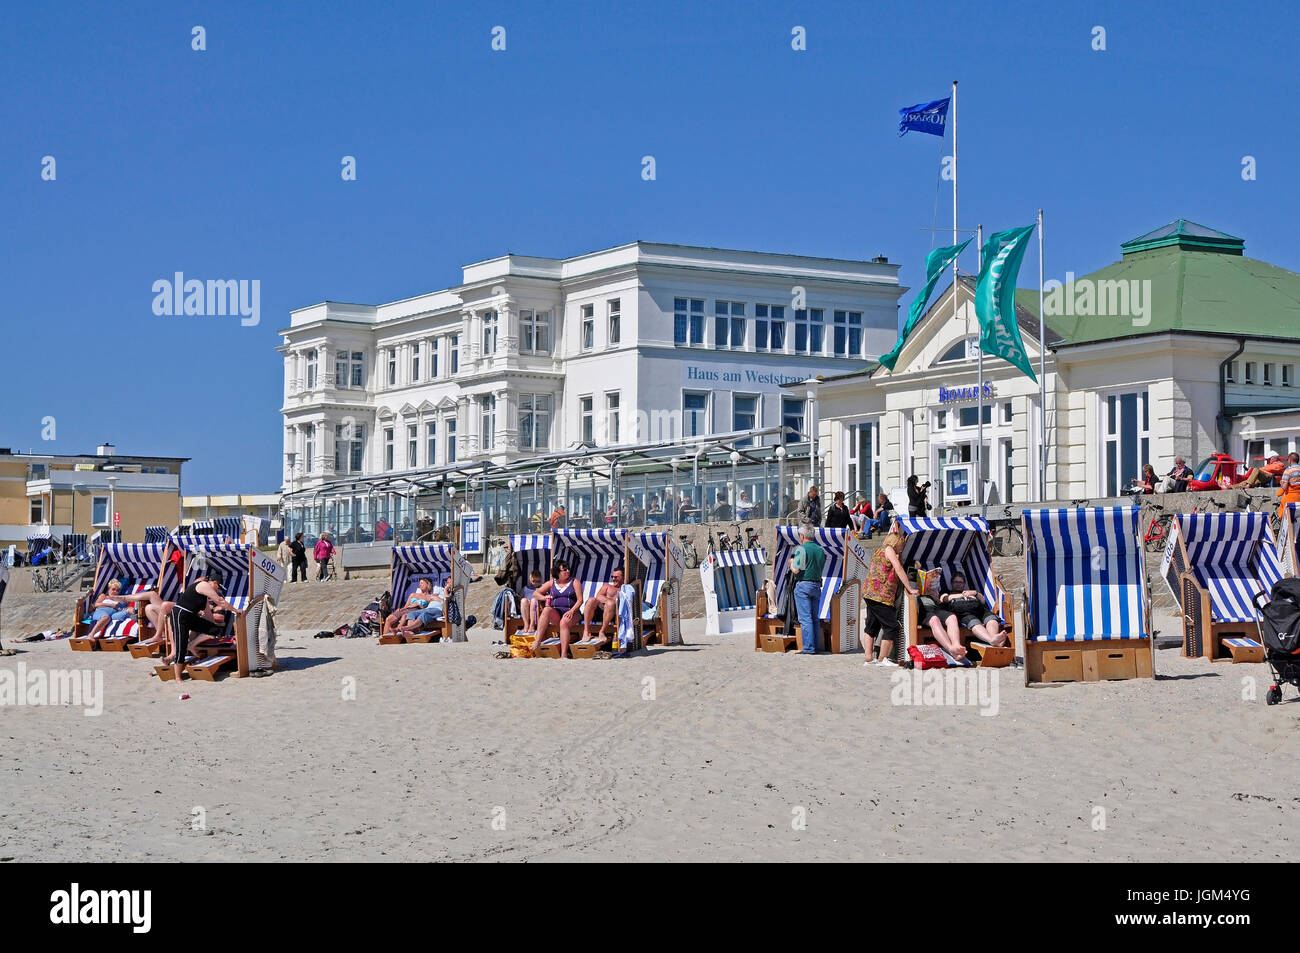 Europe, Germany, Lower Saxony, East Friesland, Friesland, scenery, blue sky, day, daylight, Outside, field recording, Stock Photo